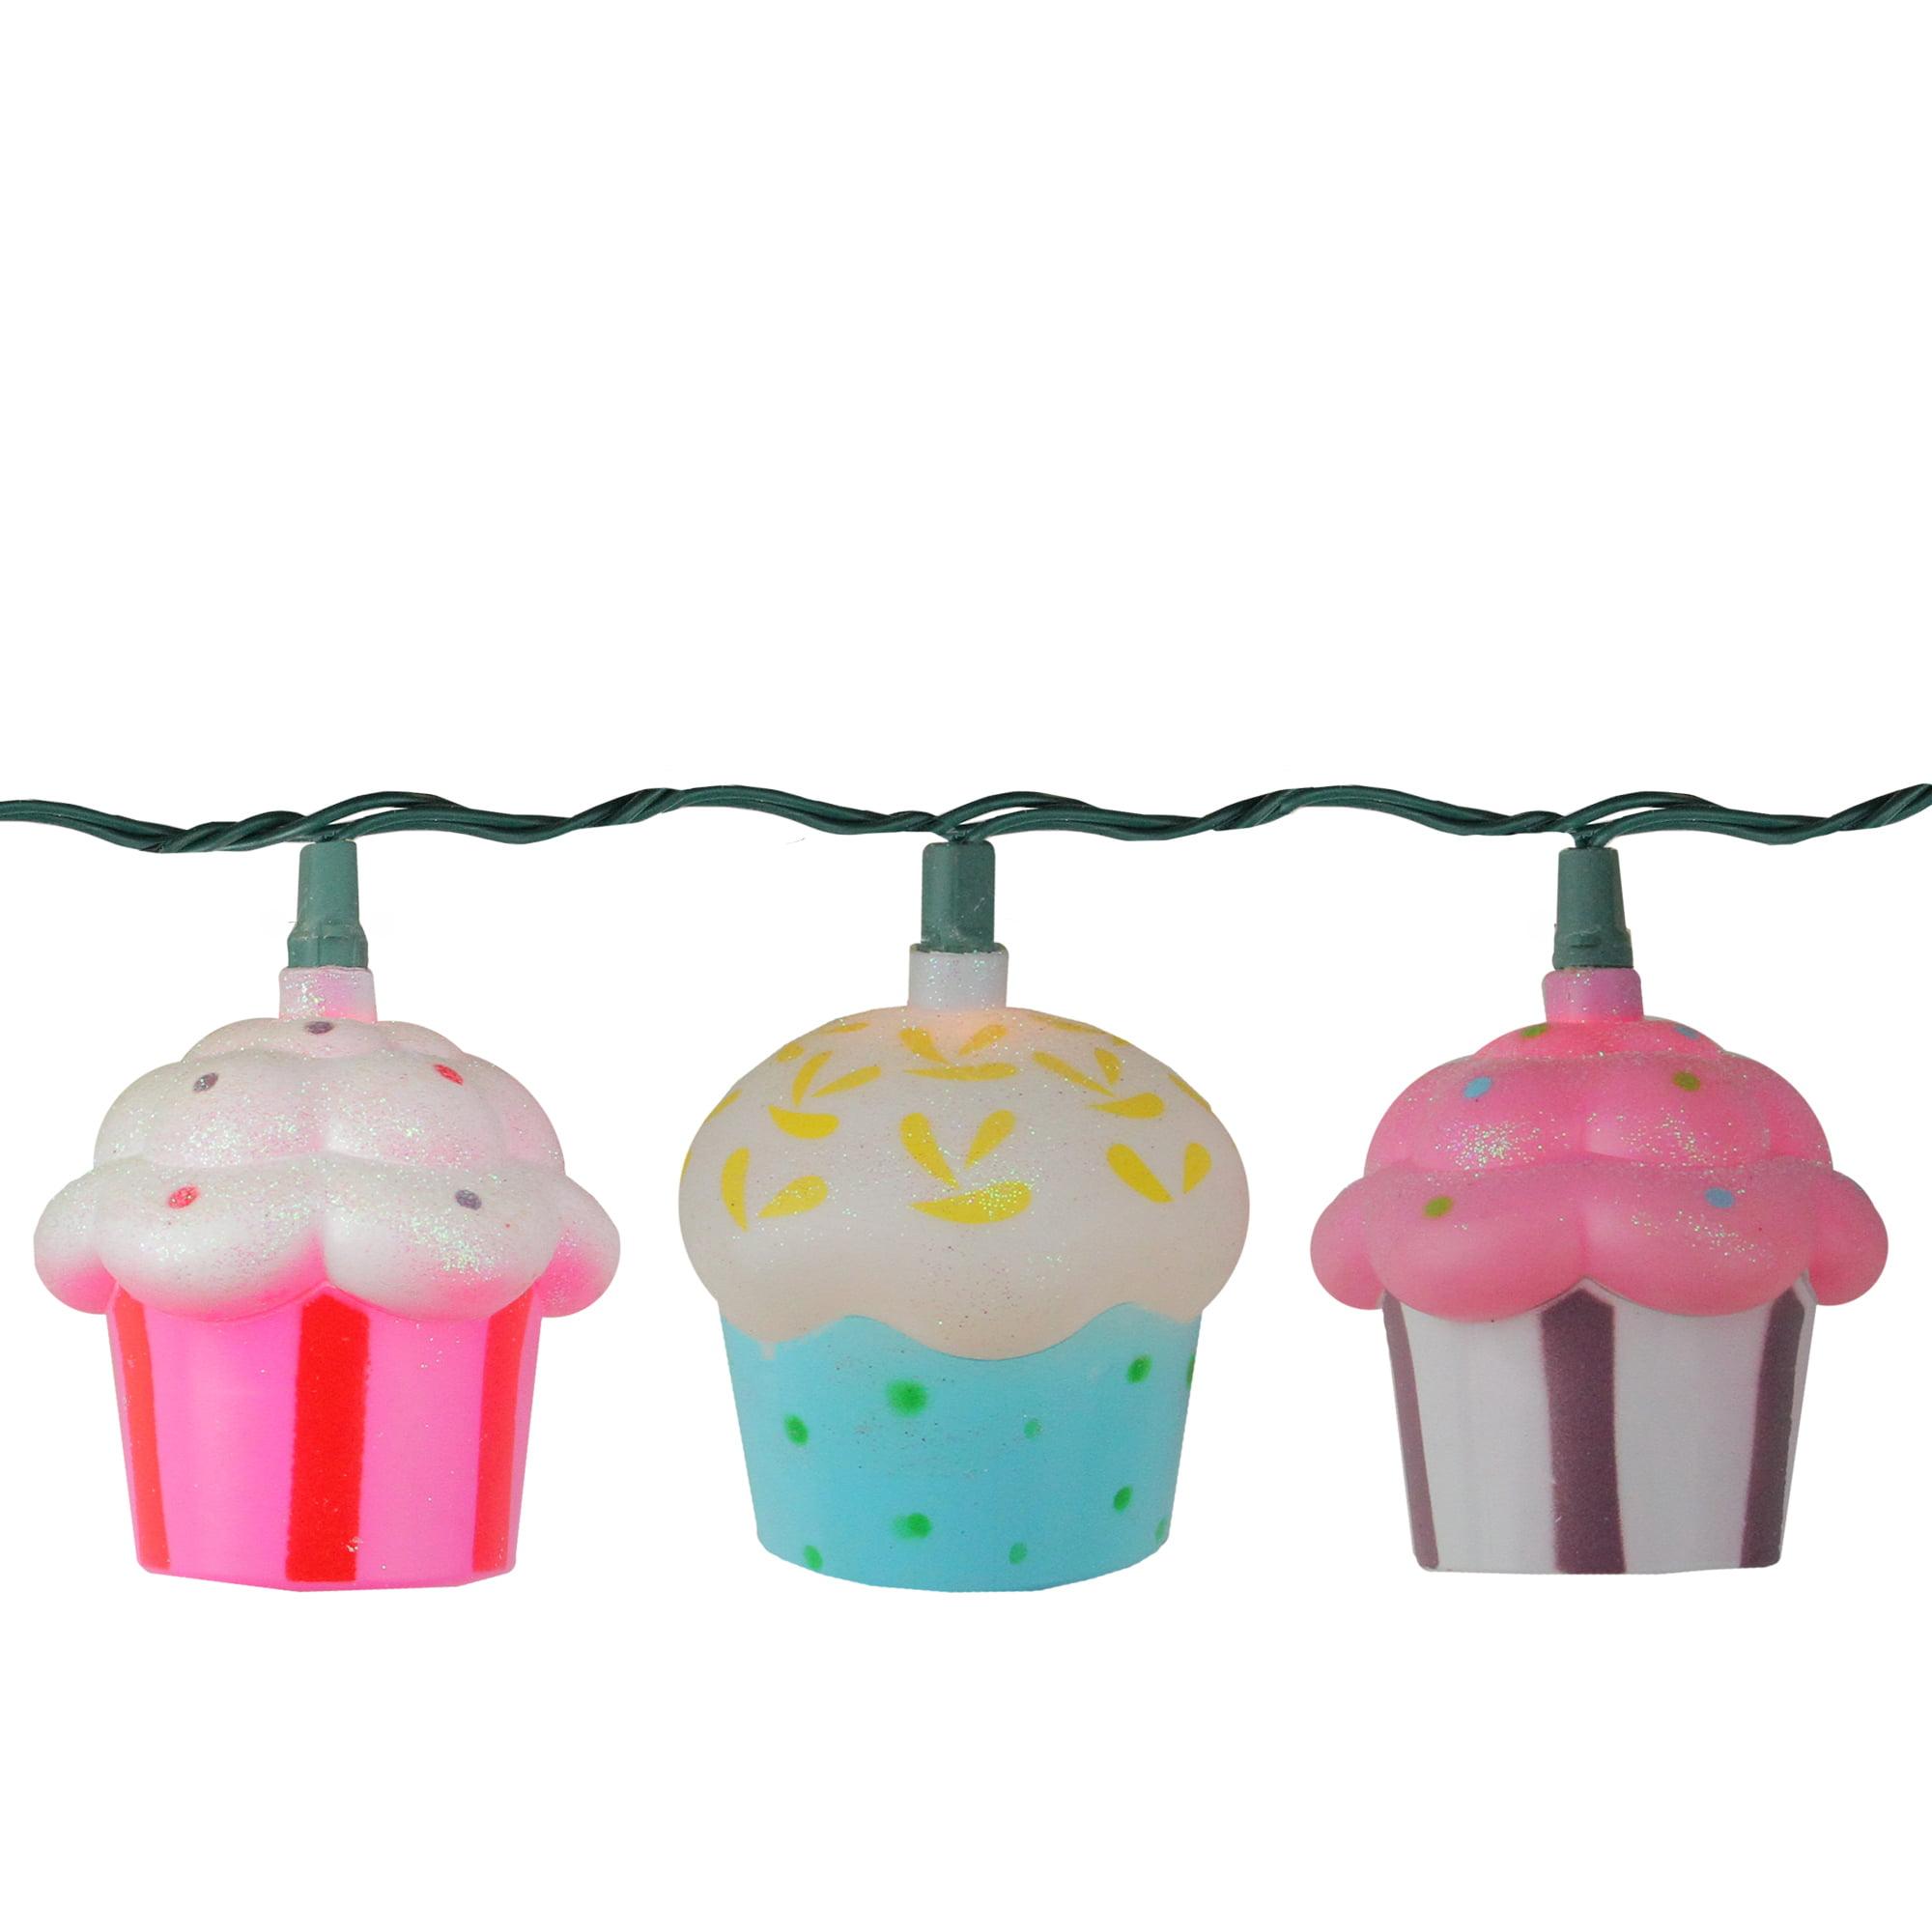 Set of 10 Glitter Cupcake Novelty Christmas Lights - 10 ft Green Wire